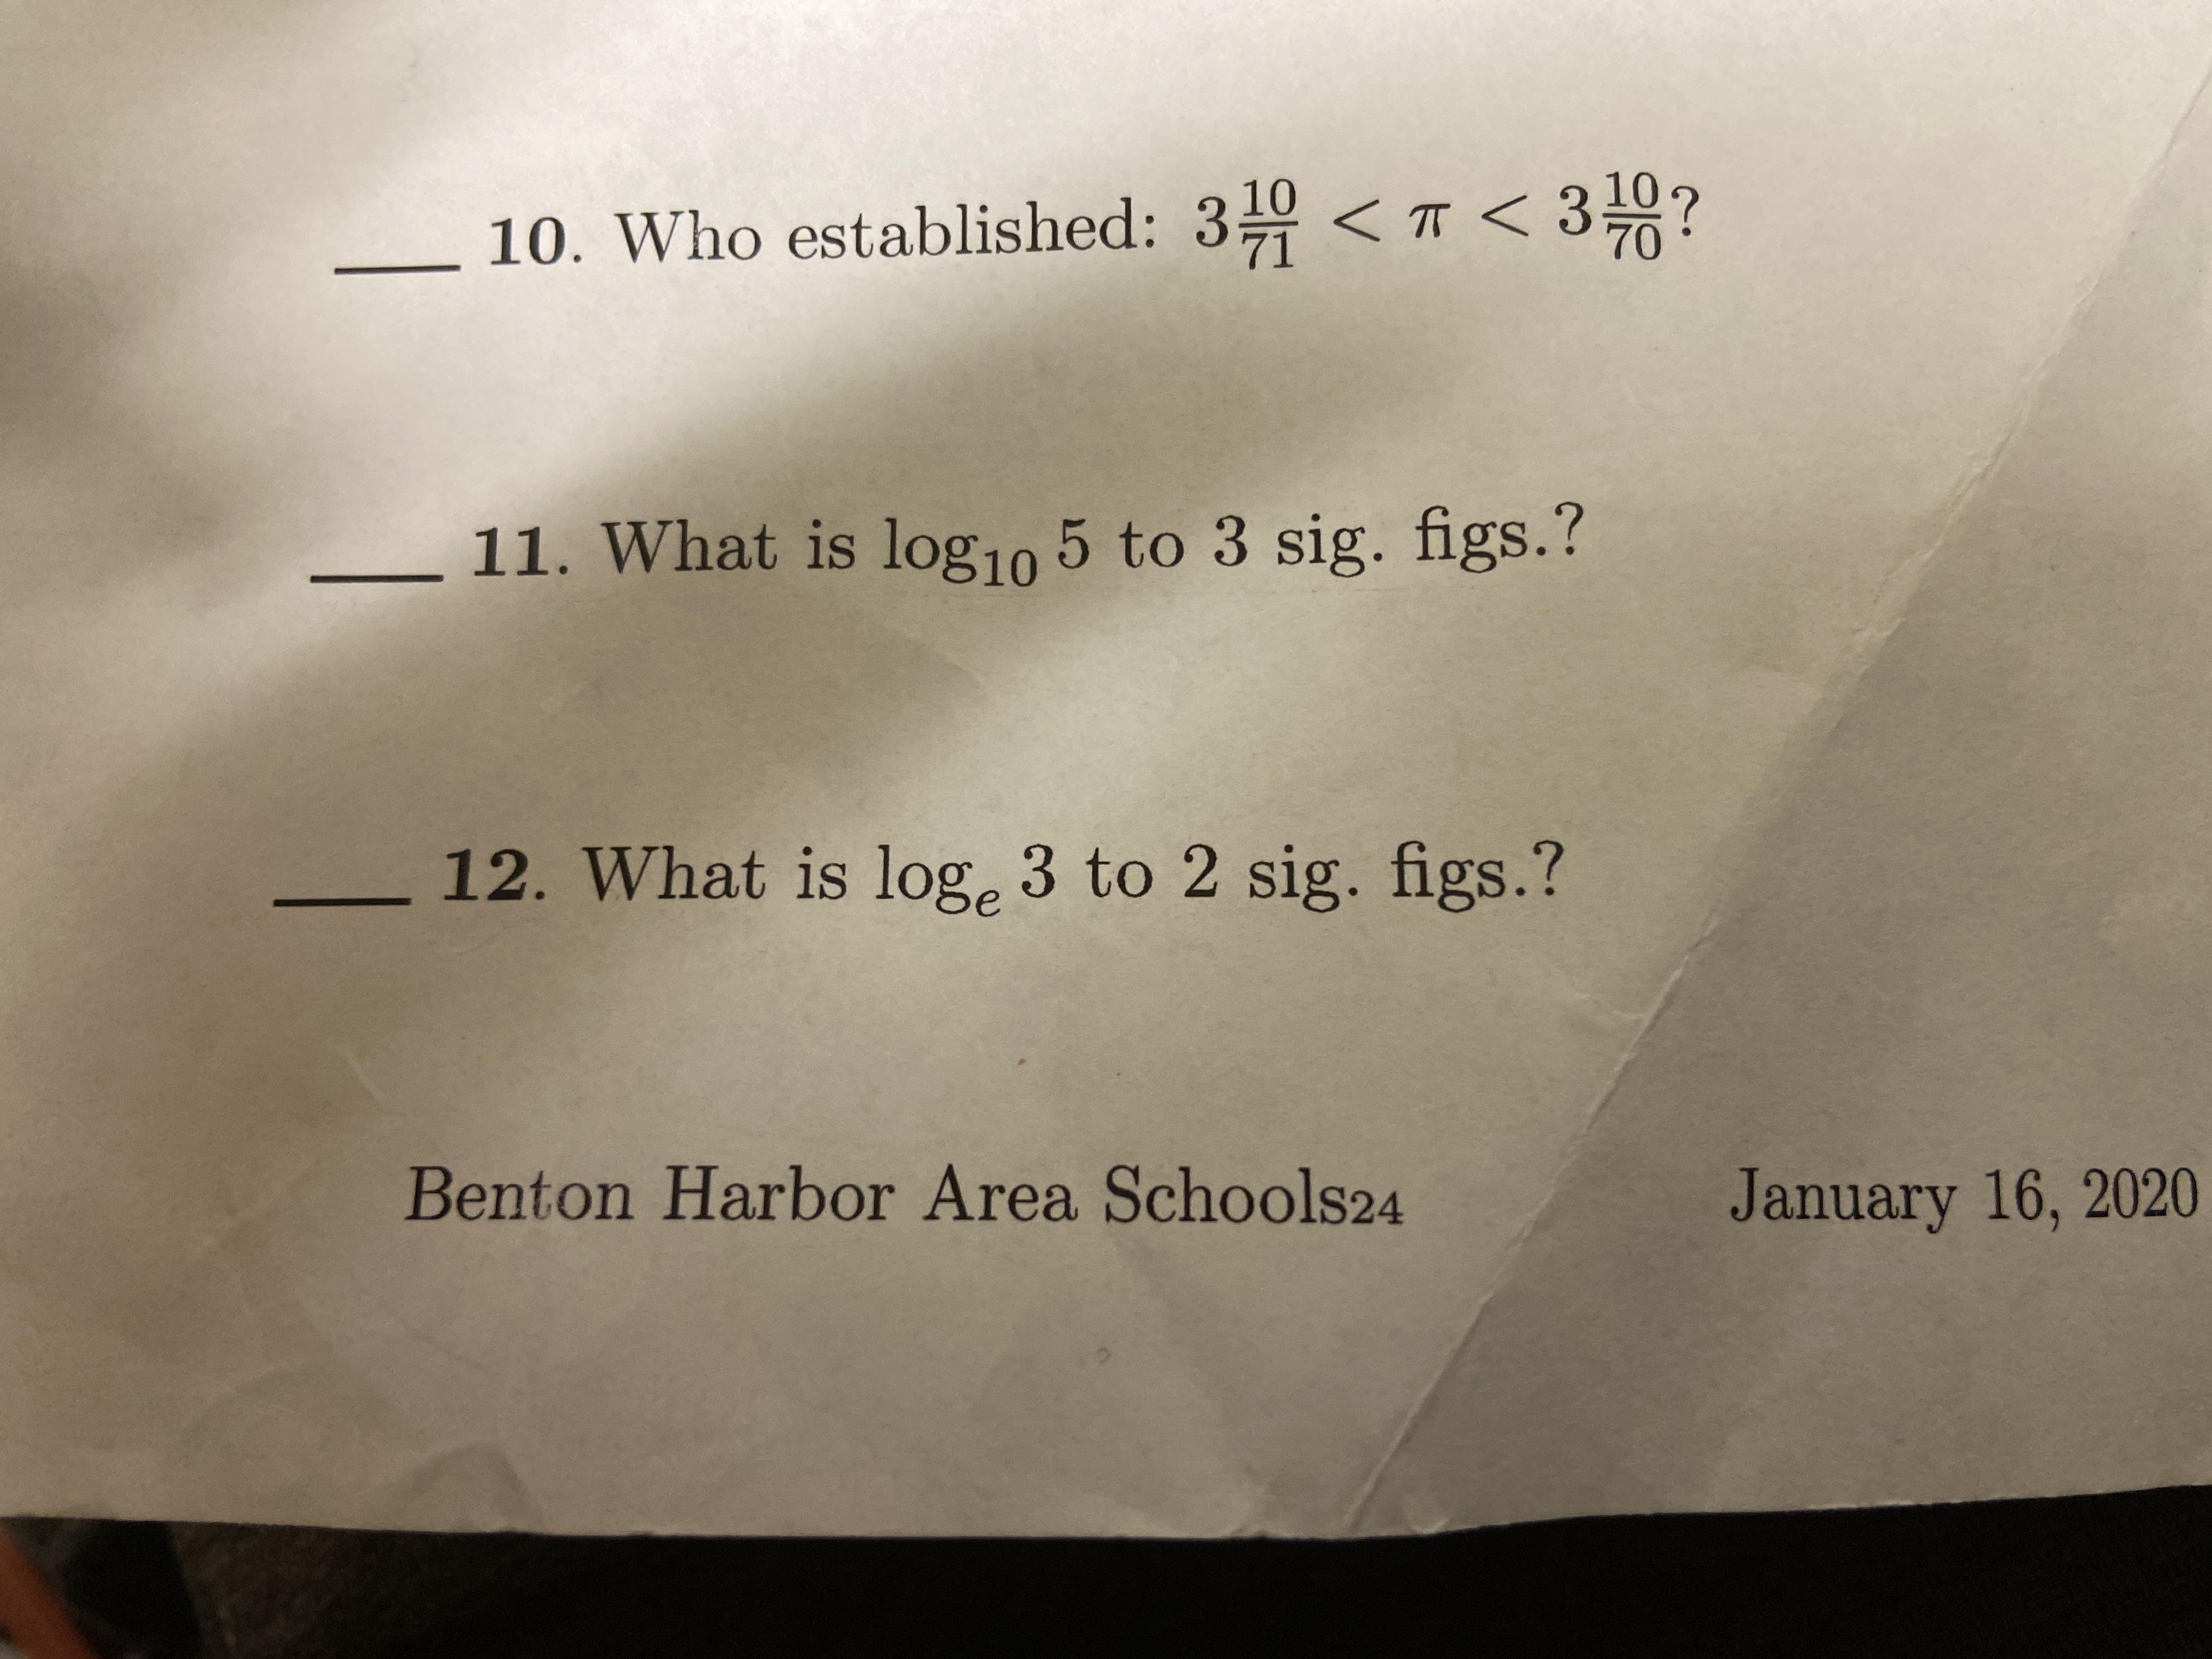 Answered 10 Who Established 3